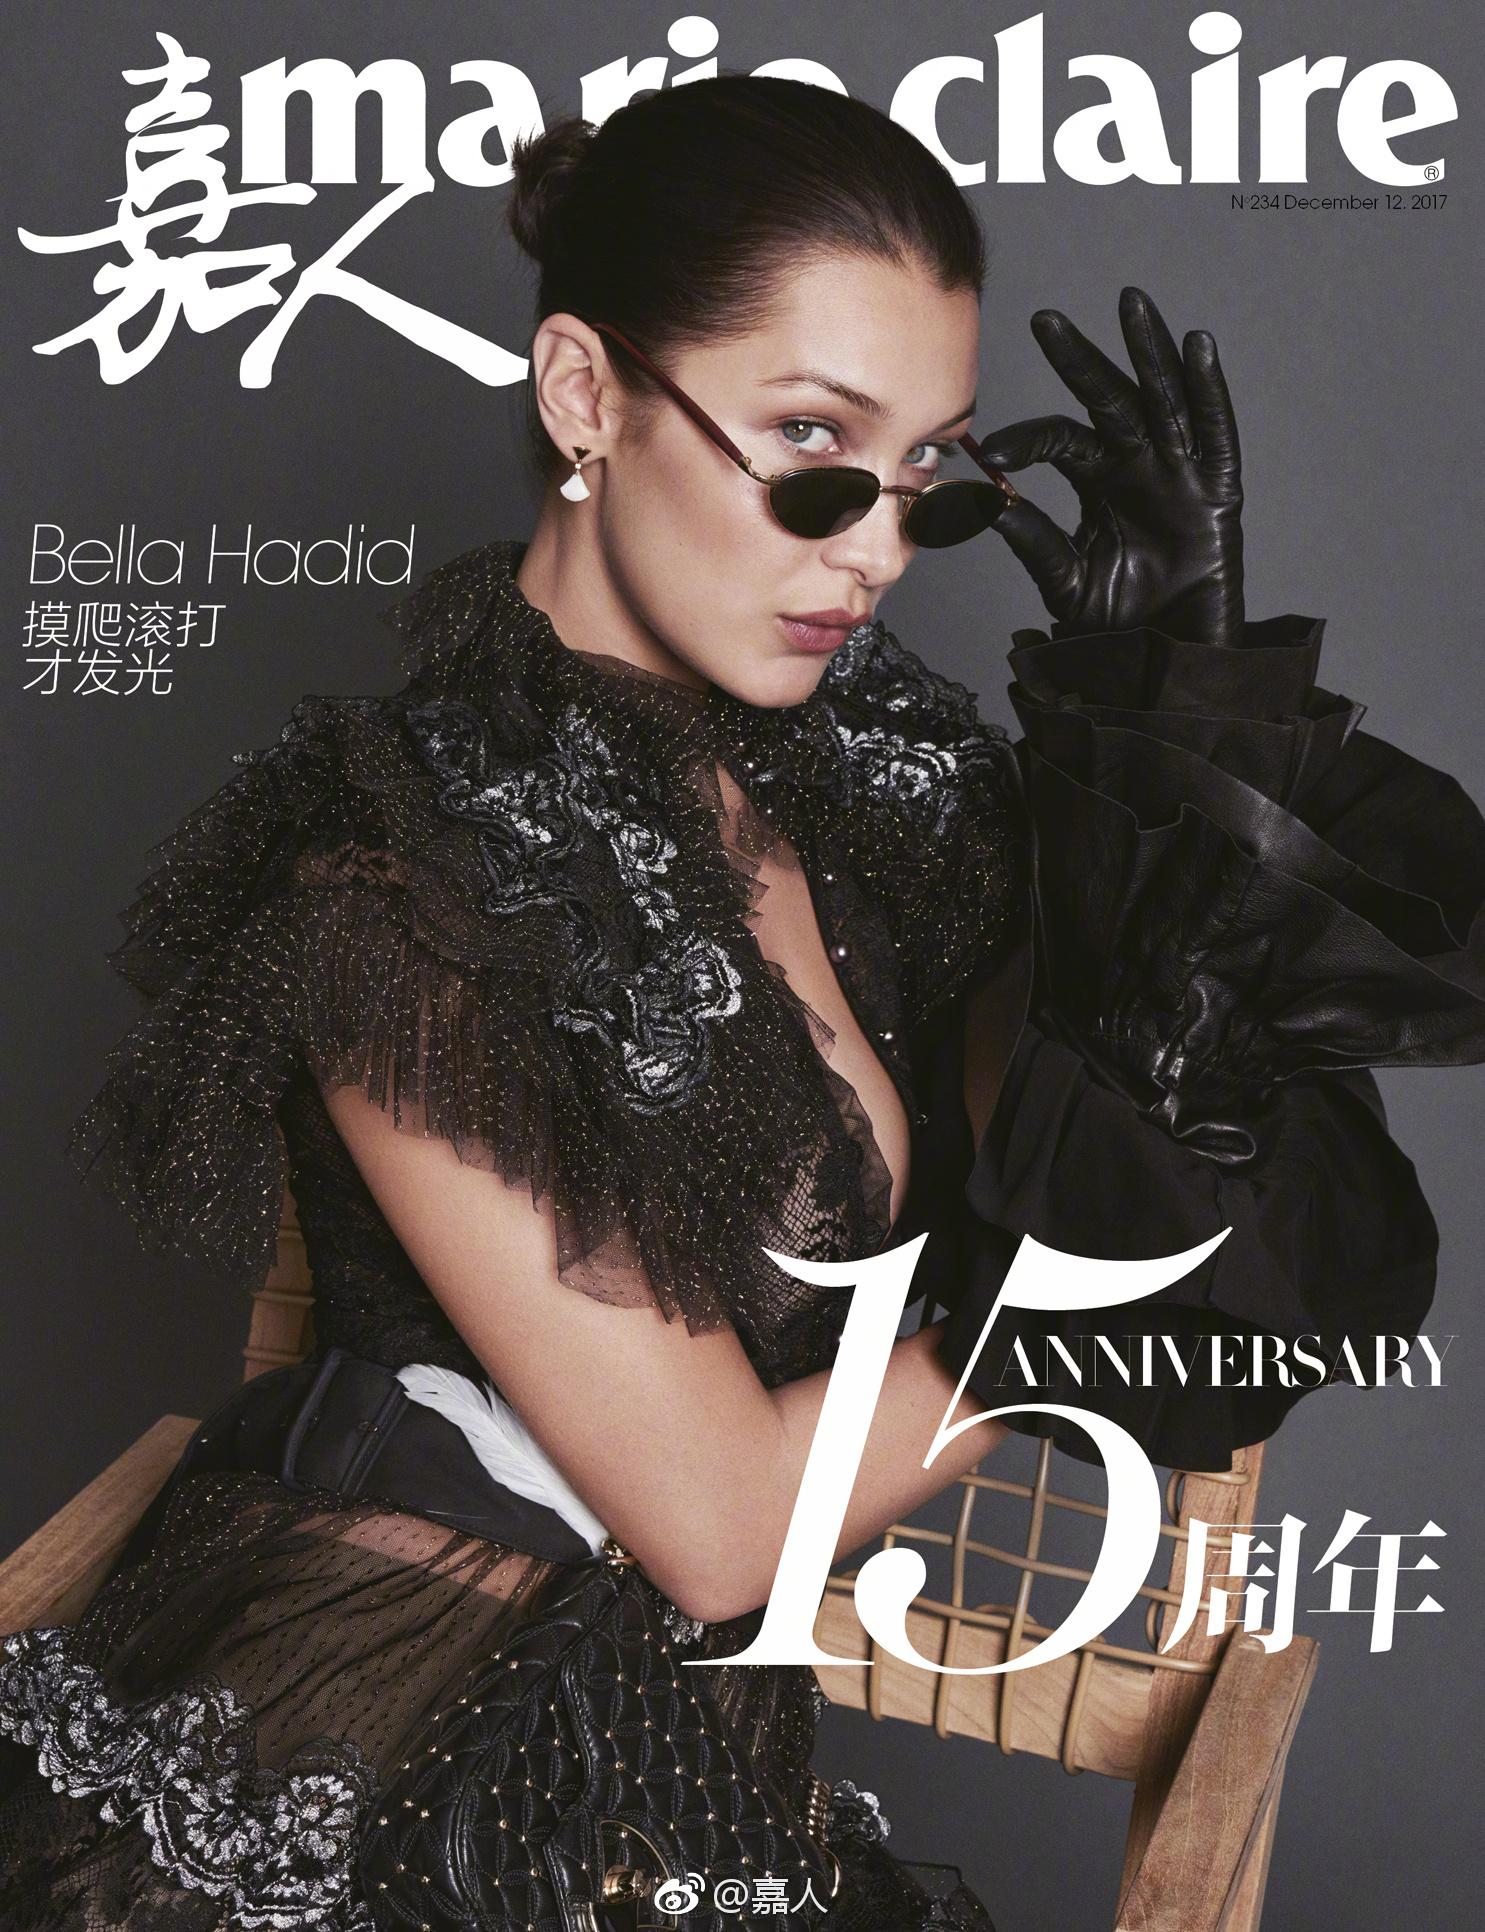 bella-hadid-marie-claire-china- (2).jpg